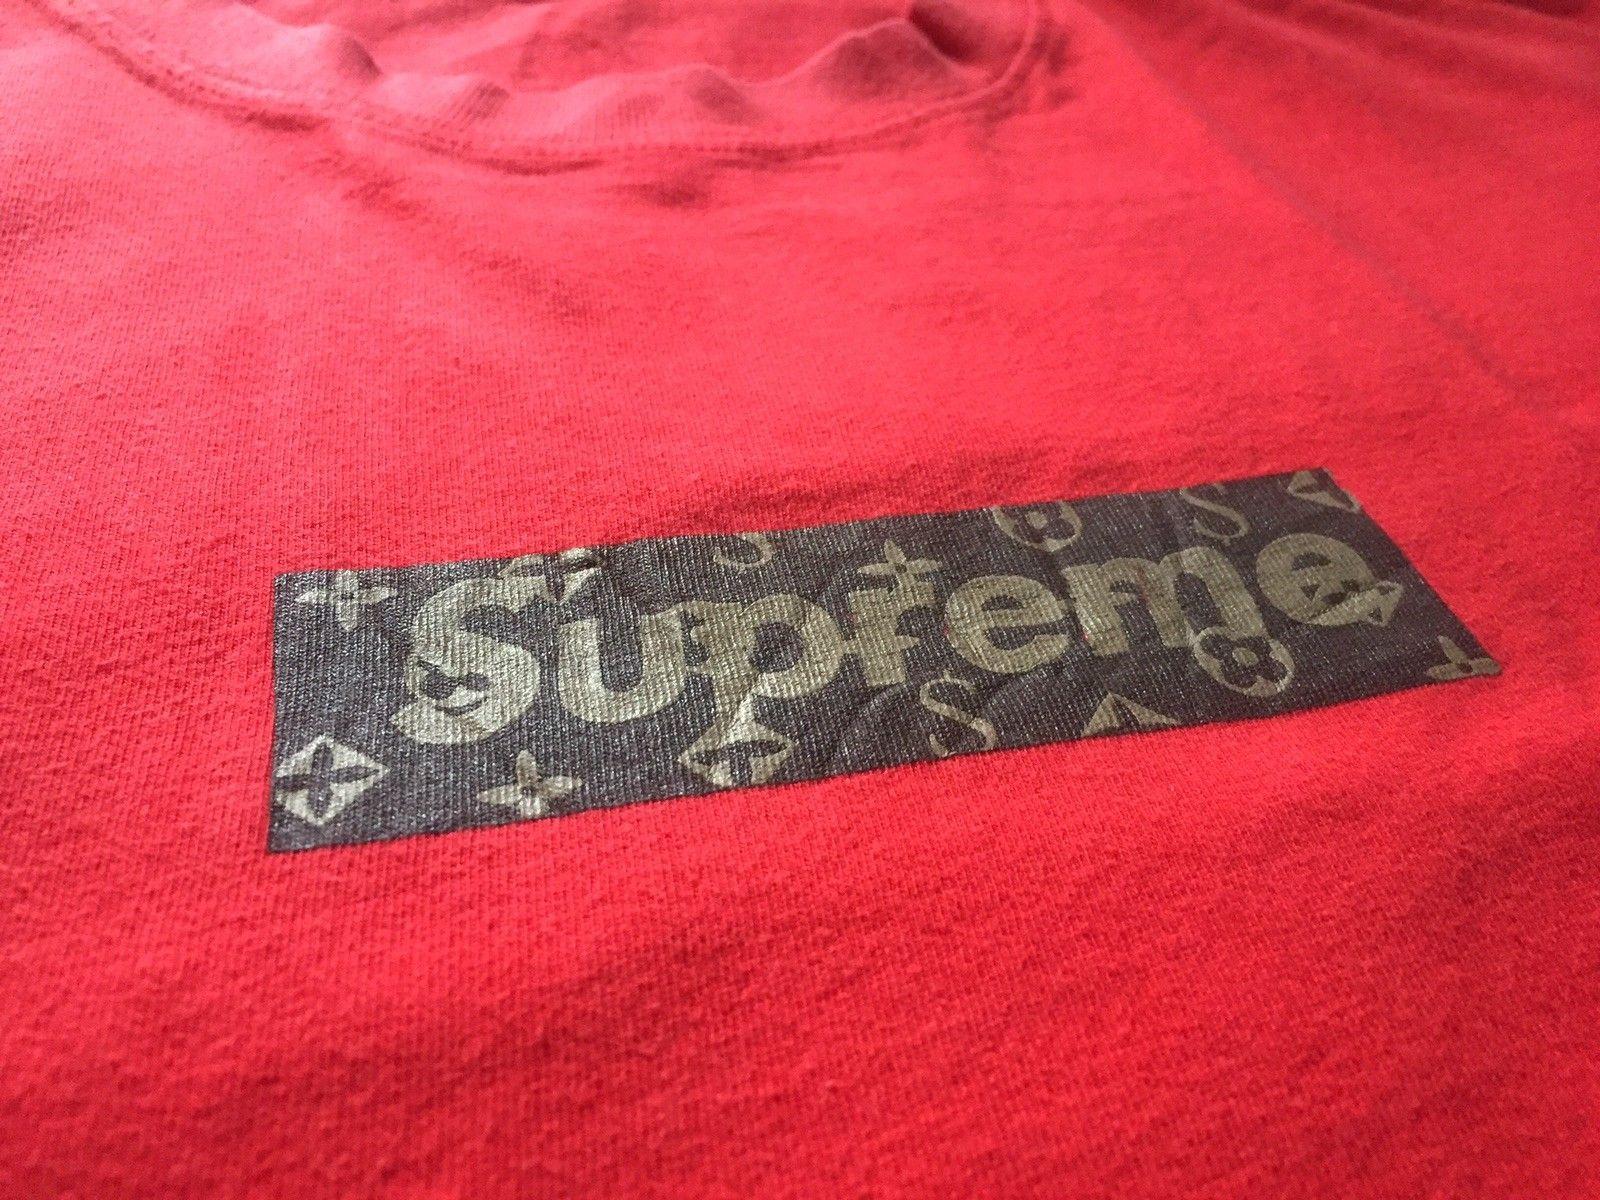 885ab9514d8 Supreme Louis Vuitton Monogram Box Logo Tee CEASE AND DESIST 2000 Sz XL Vtg  LV